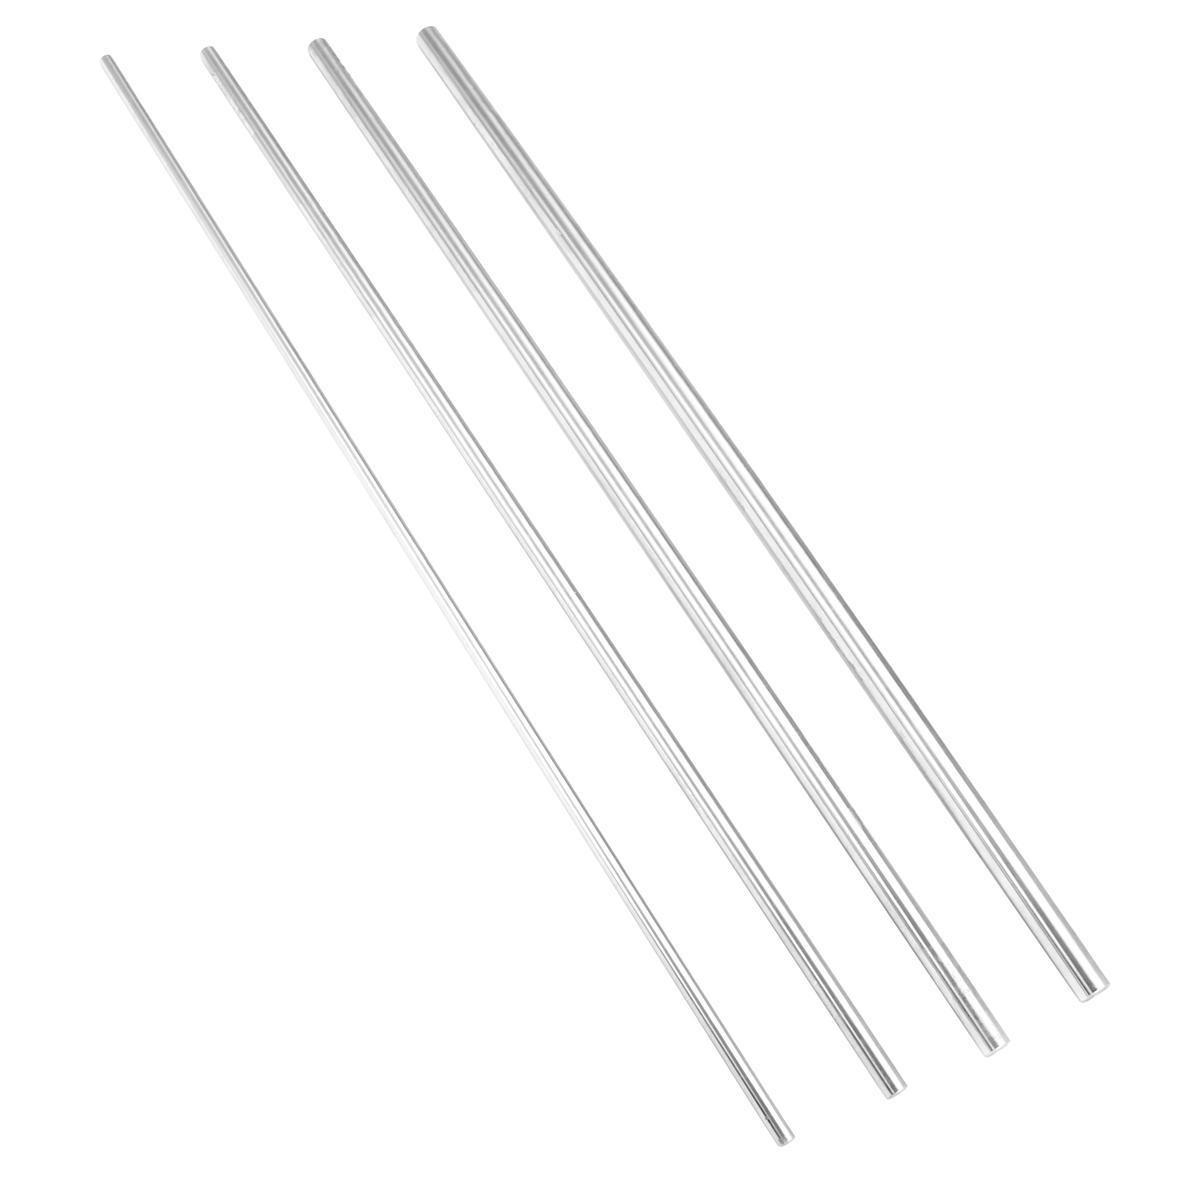 6 8 10 12mm Diameter 450mm Length Linear Rail Shaft Rod